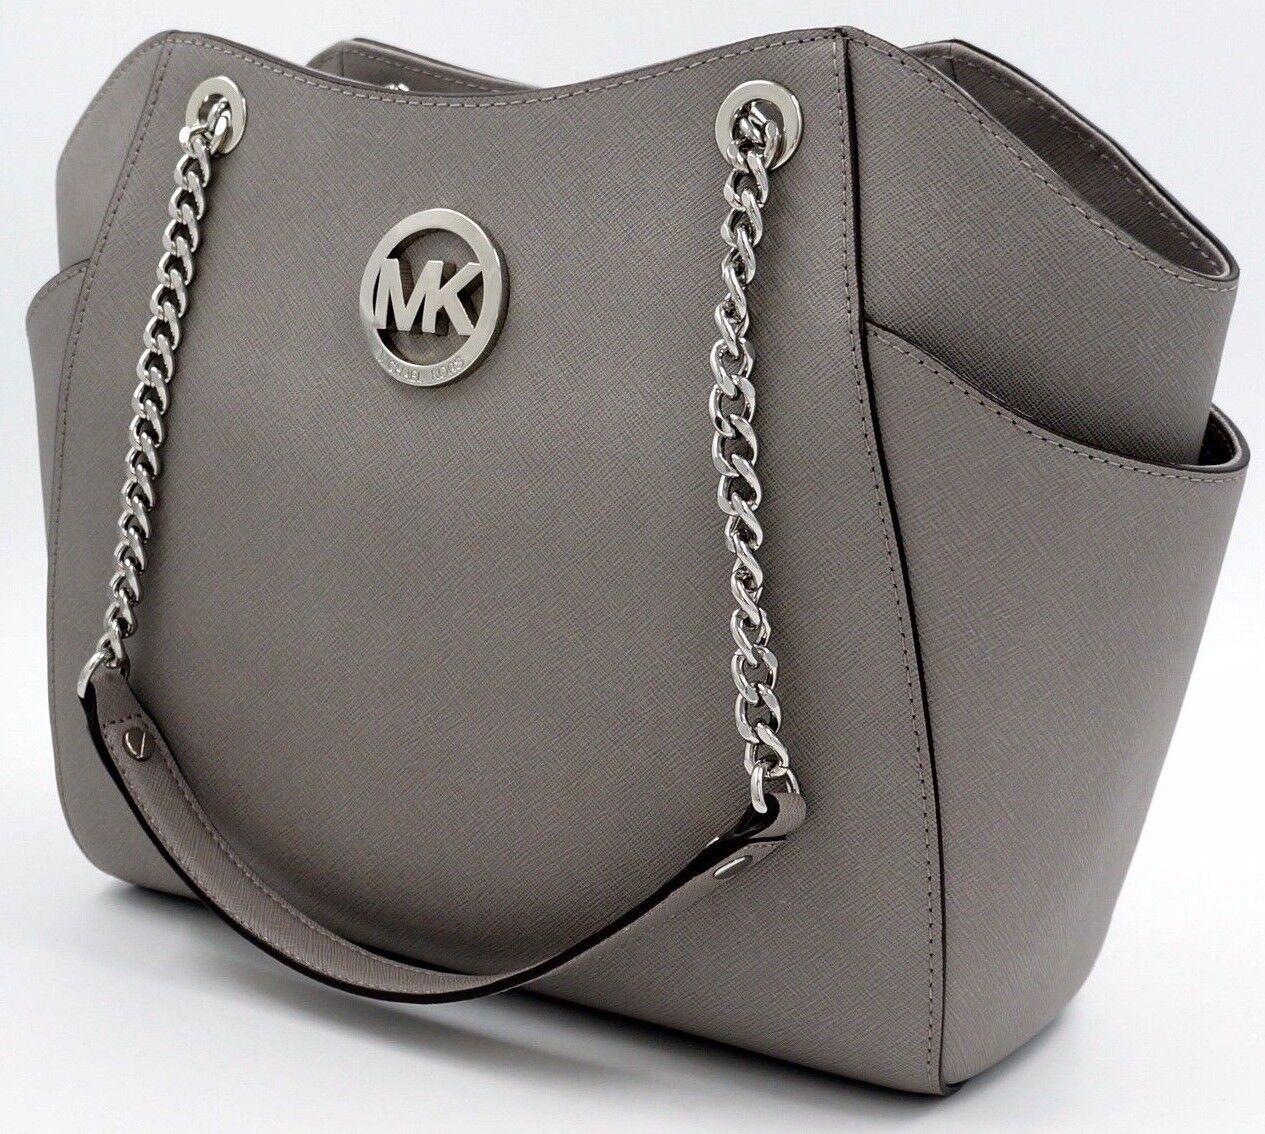 Michael Kors - NWT Michael Kors Grey  Saffiano Leather Jet Set Travel Chain Shoulder Tote Bag